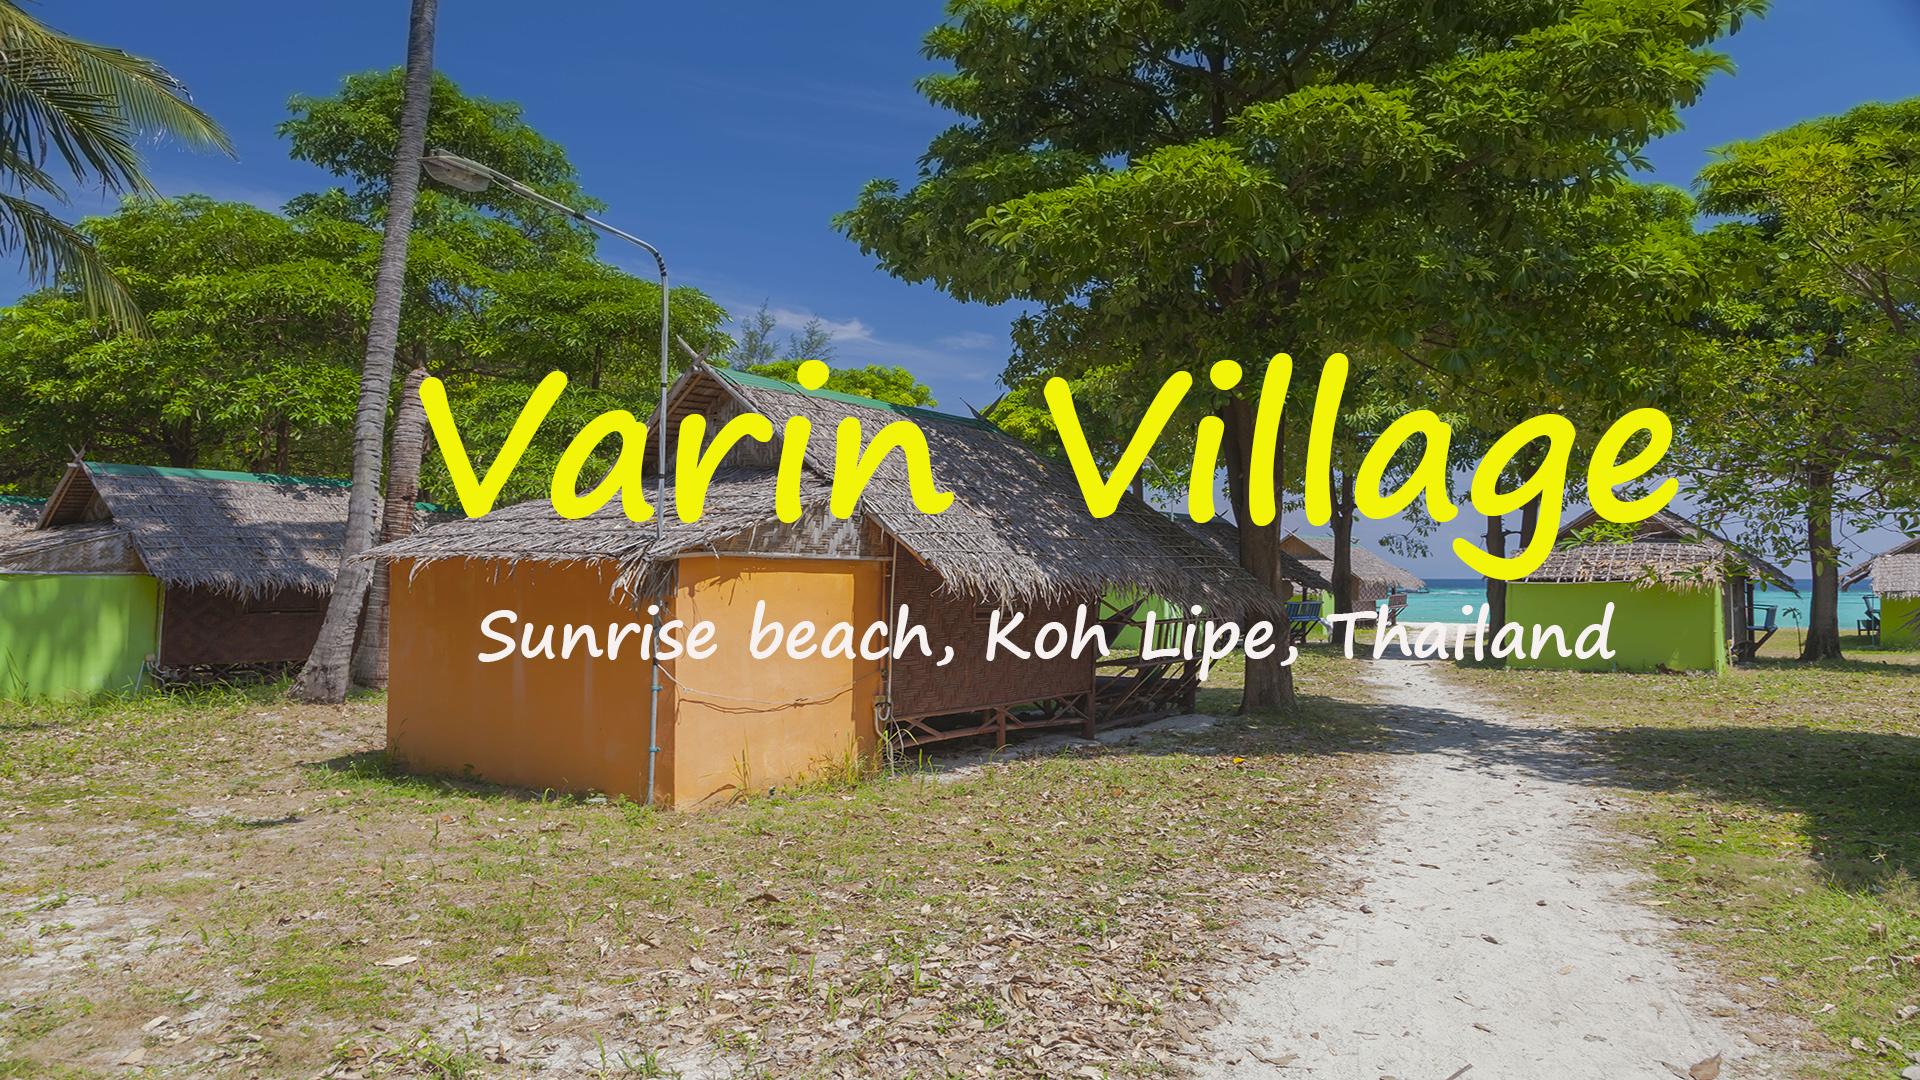 Видео обзор территории Varin Village